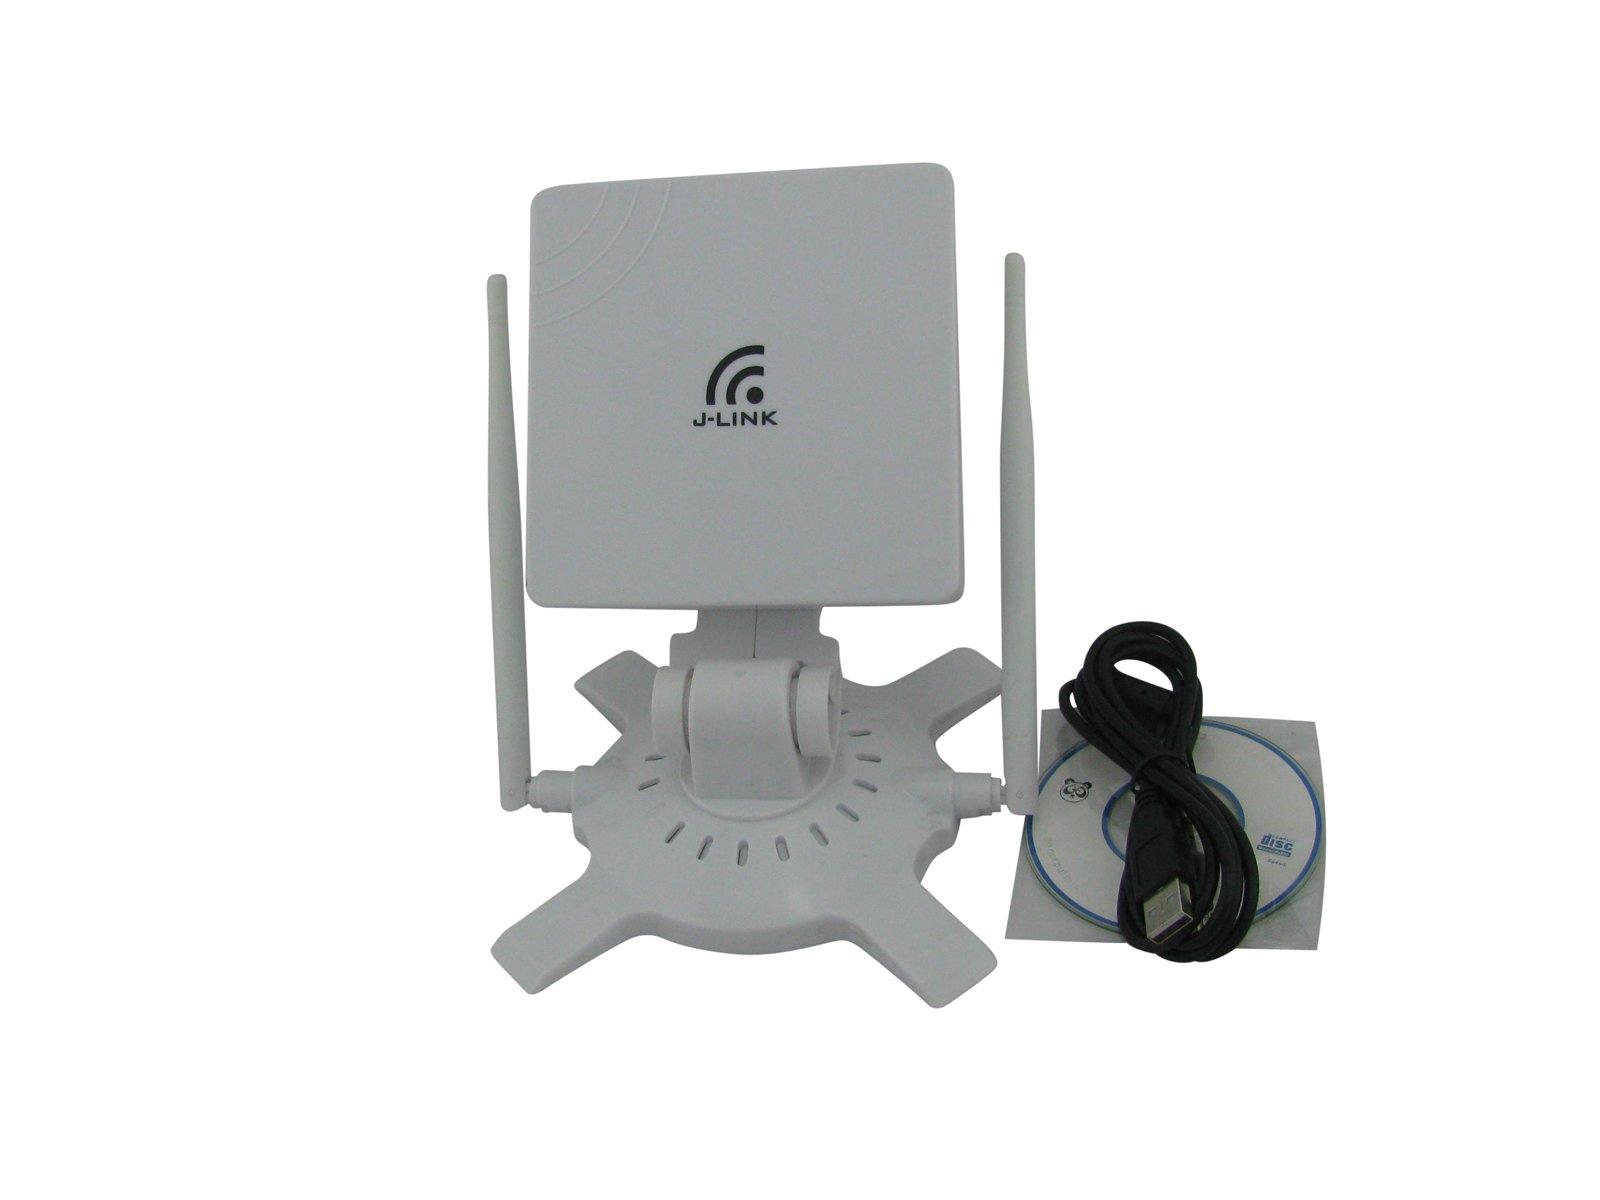 Super Power Supply High Power Long Range High Sensitivity Clipper USB WiFi Network Adapter B/G/N with 1 x 16dBi 2.4GHz Panel High Gain Directional Antenna + 2 x 6dBi Omni Antennas 24dBi 48dBi 150Mbps